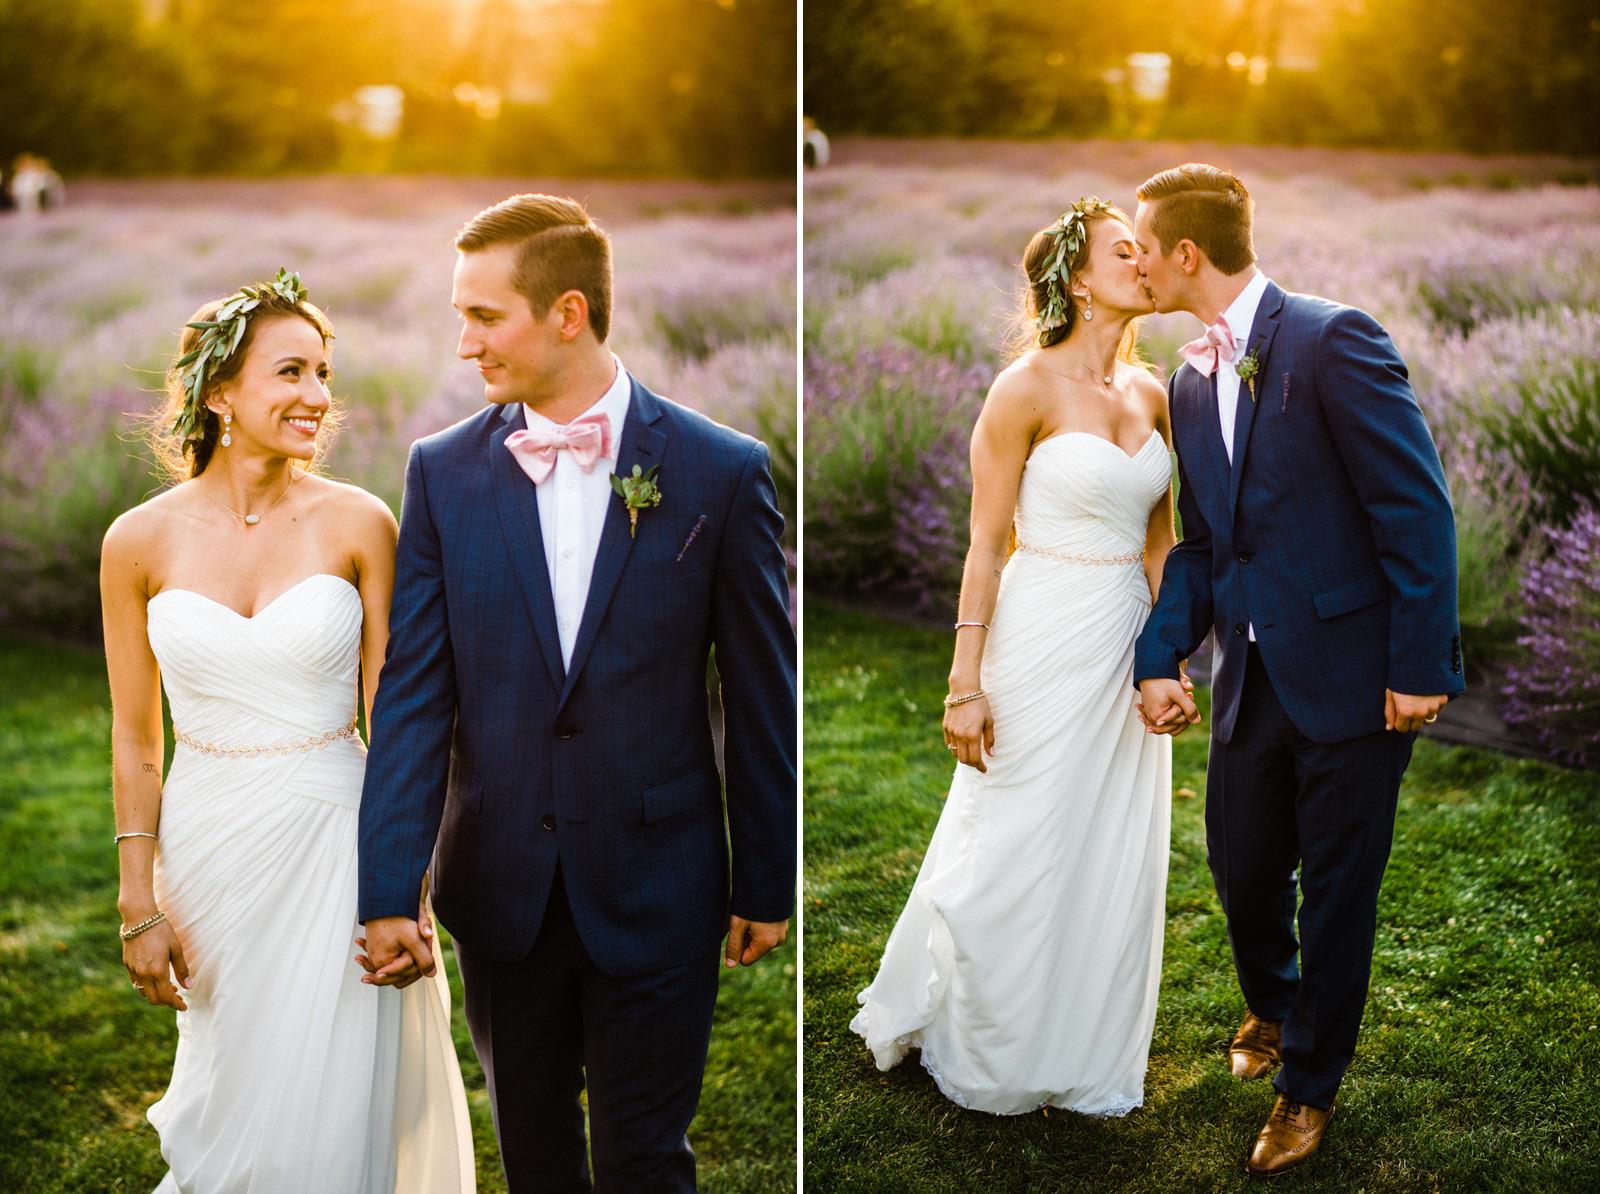 101-woodinville-lavendar-farm-wedding-with-golden-glowy-photos.jpg